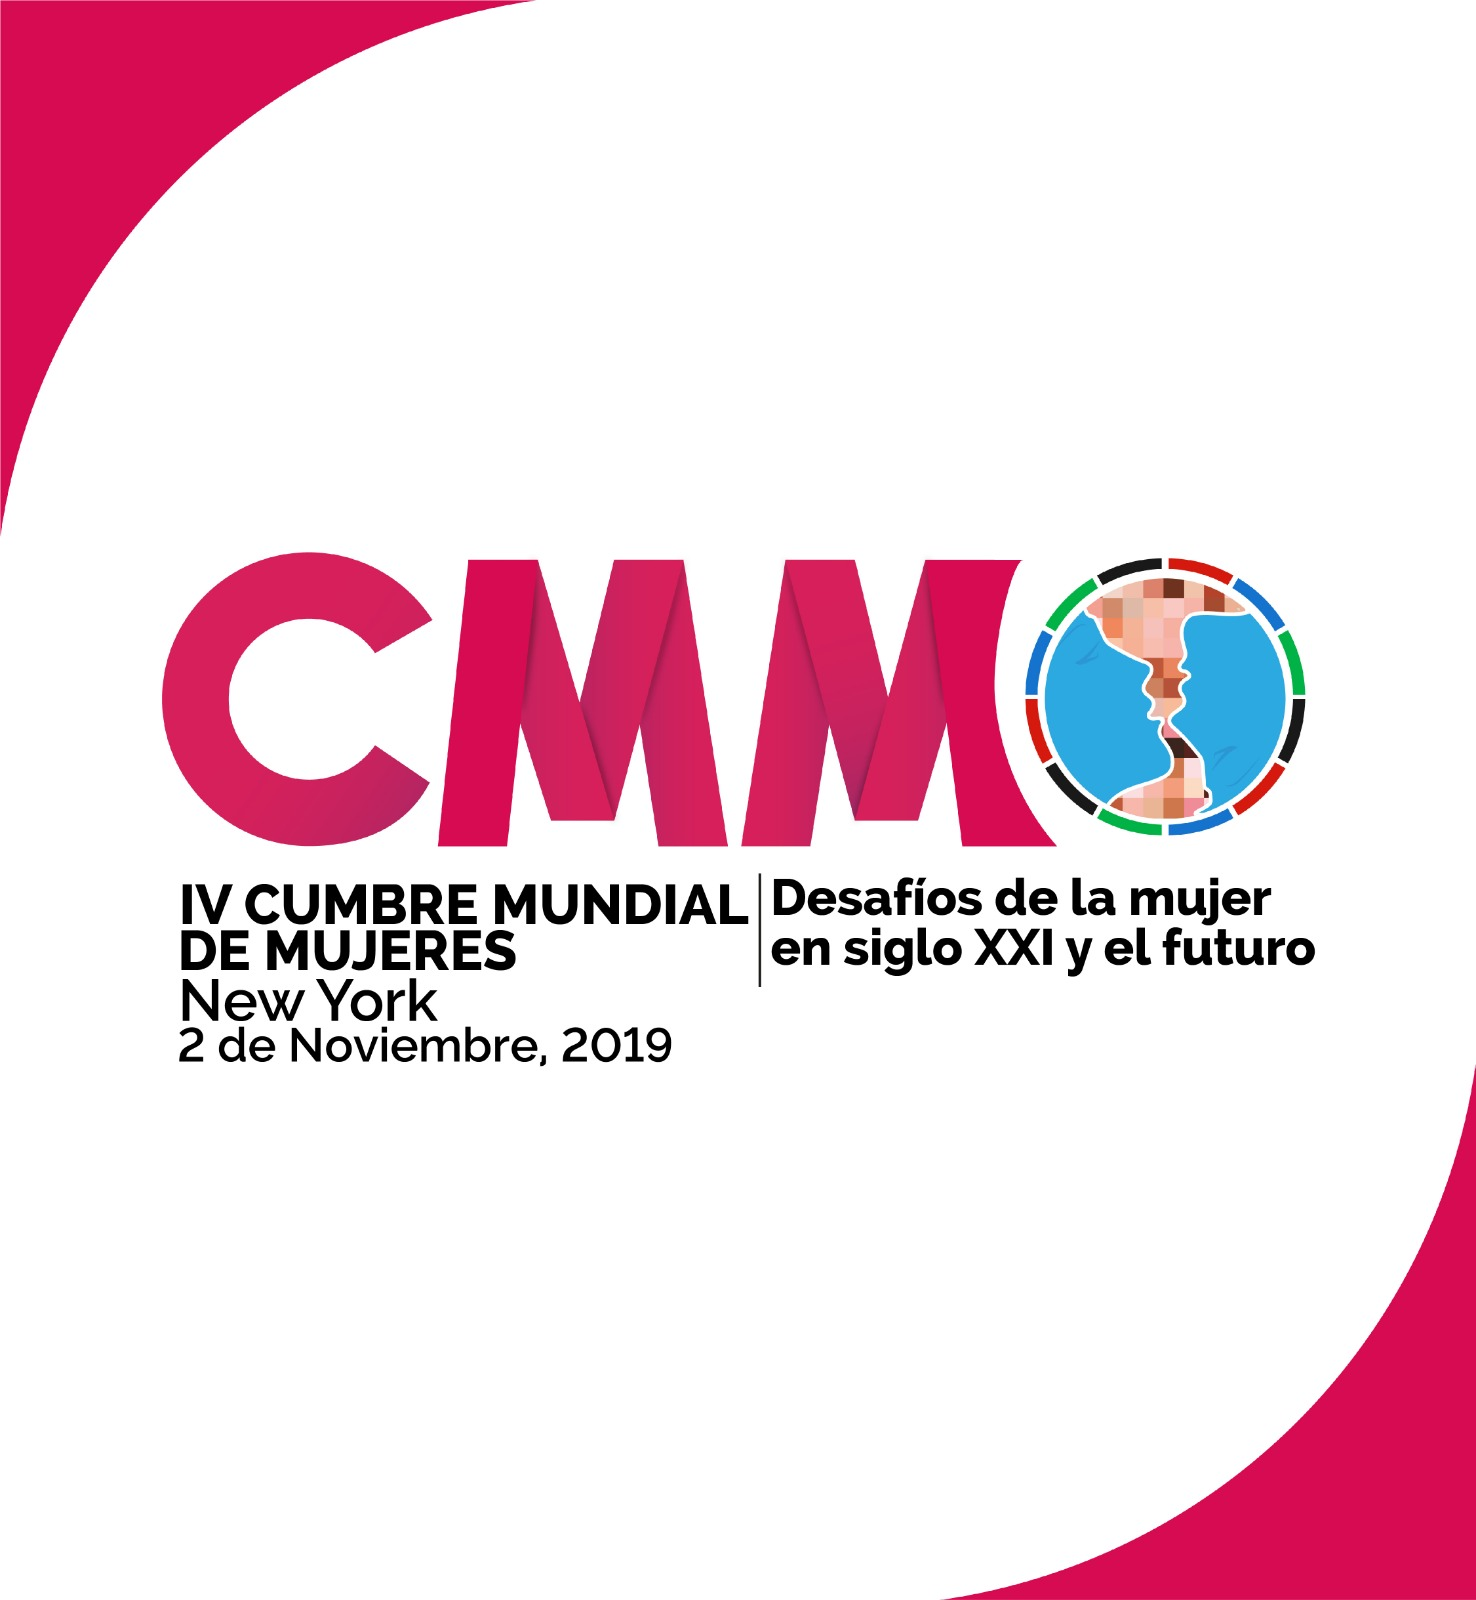 CUMBRE MUNDIAL DE MUJERES